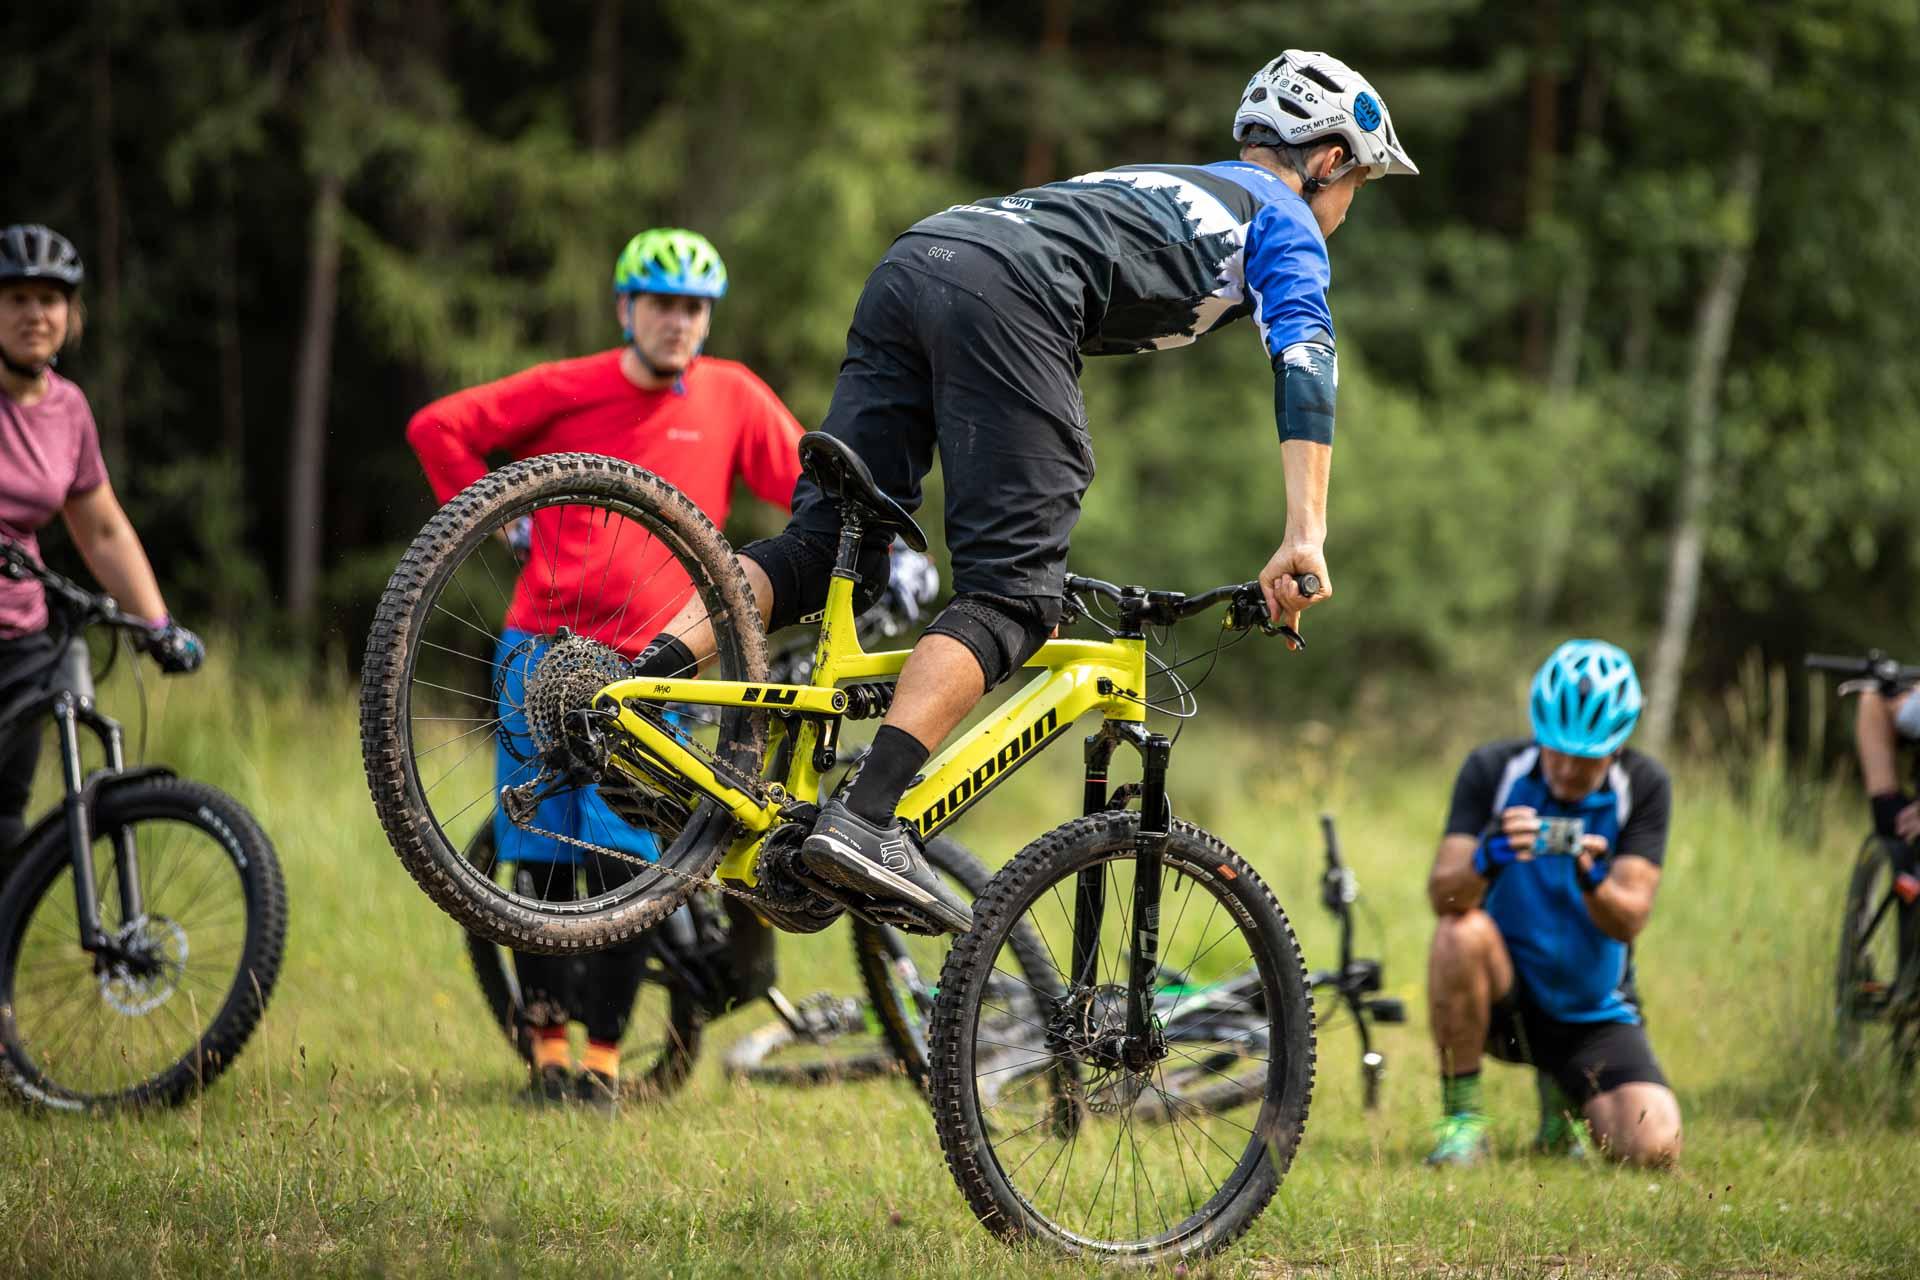 eMTB eBike Fortgeschritten Fahrtechnik Kurs in Siegen - Rock my Trail Bikeschule318